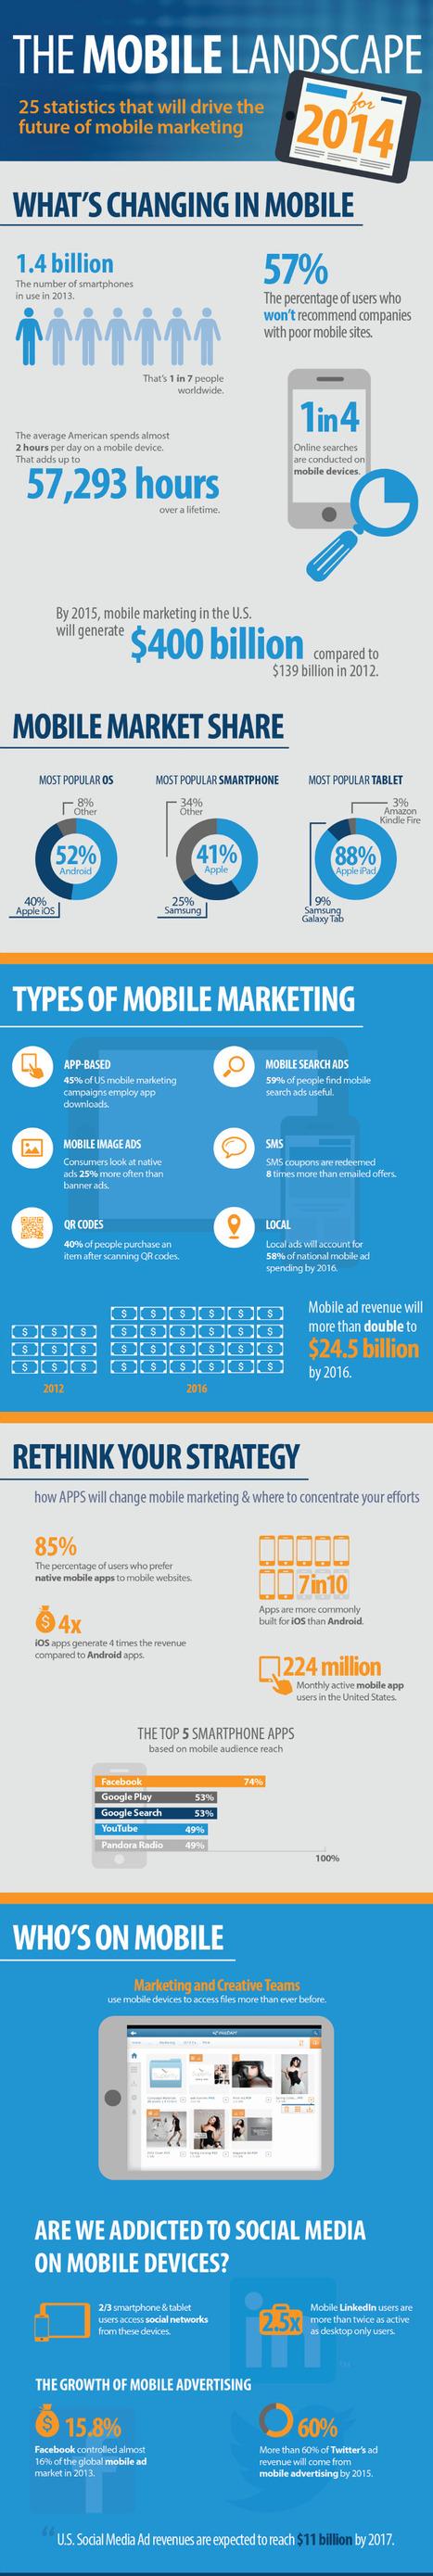 2014 Social Media & Mobile Marketing Trends  - #Infographic | SEO & Social Media | Scoop.it